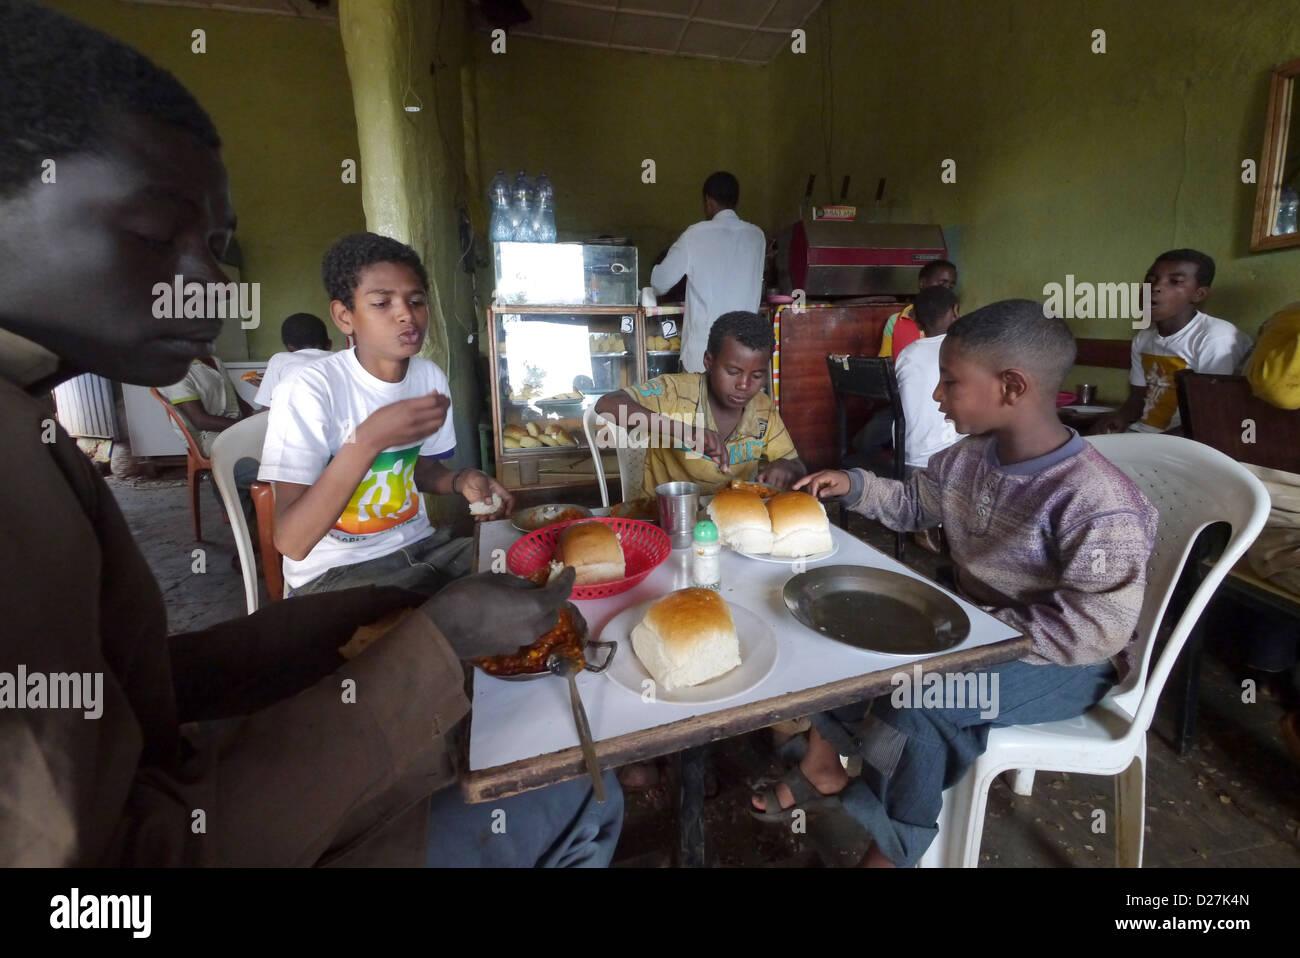 ETHIOPIA The 'Salam Cafe' in Chagni, Beni Shangul Gumuz region. Boys having breakfast of beans. Stock Photo